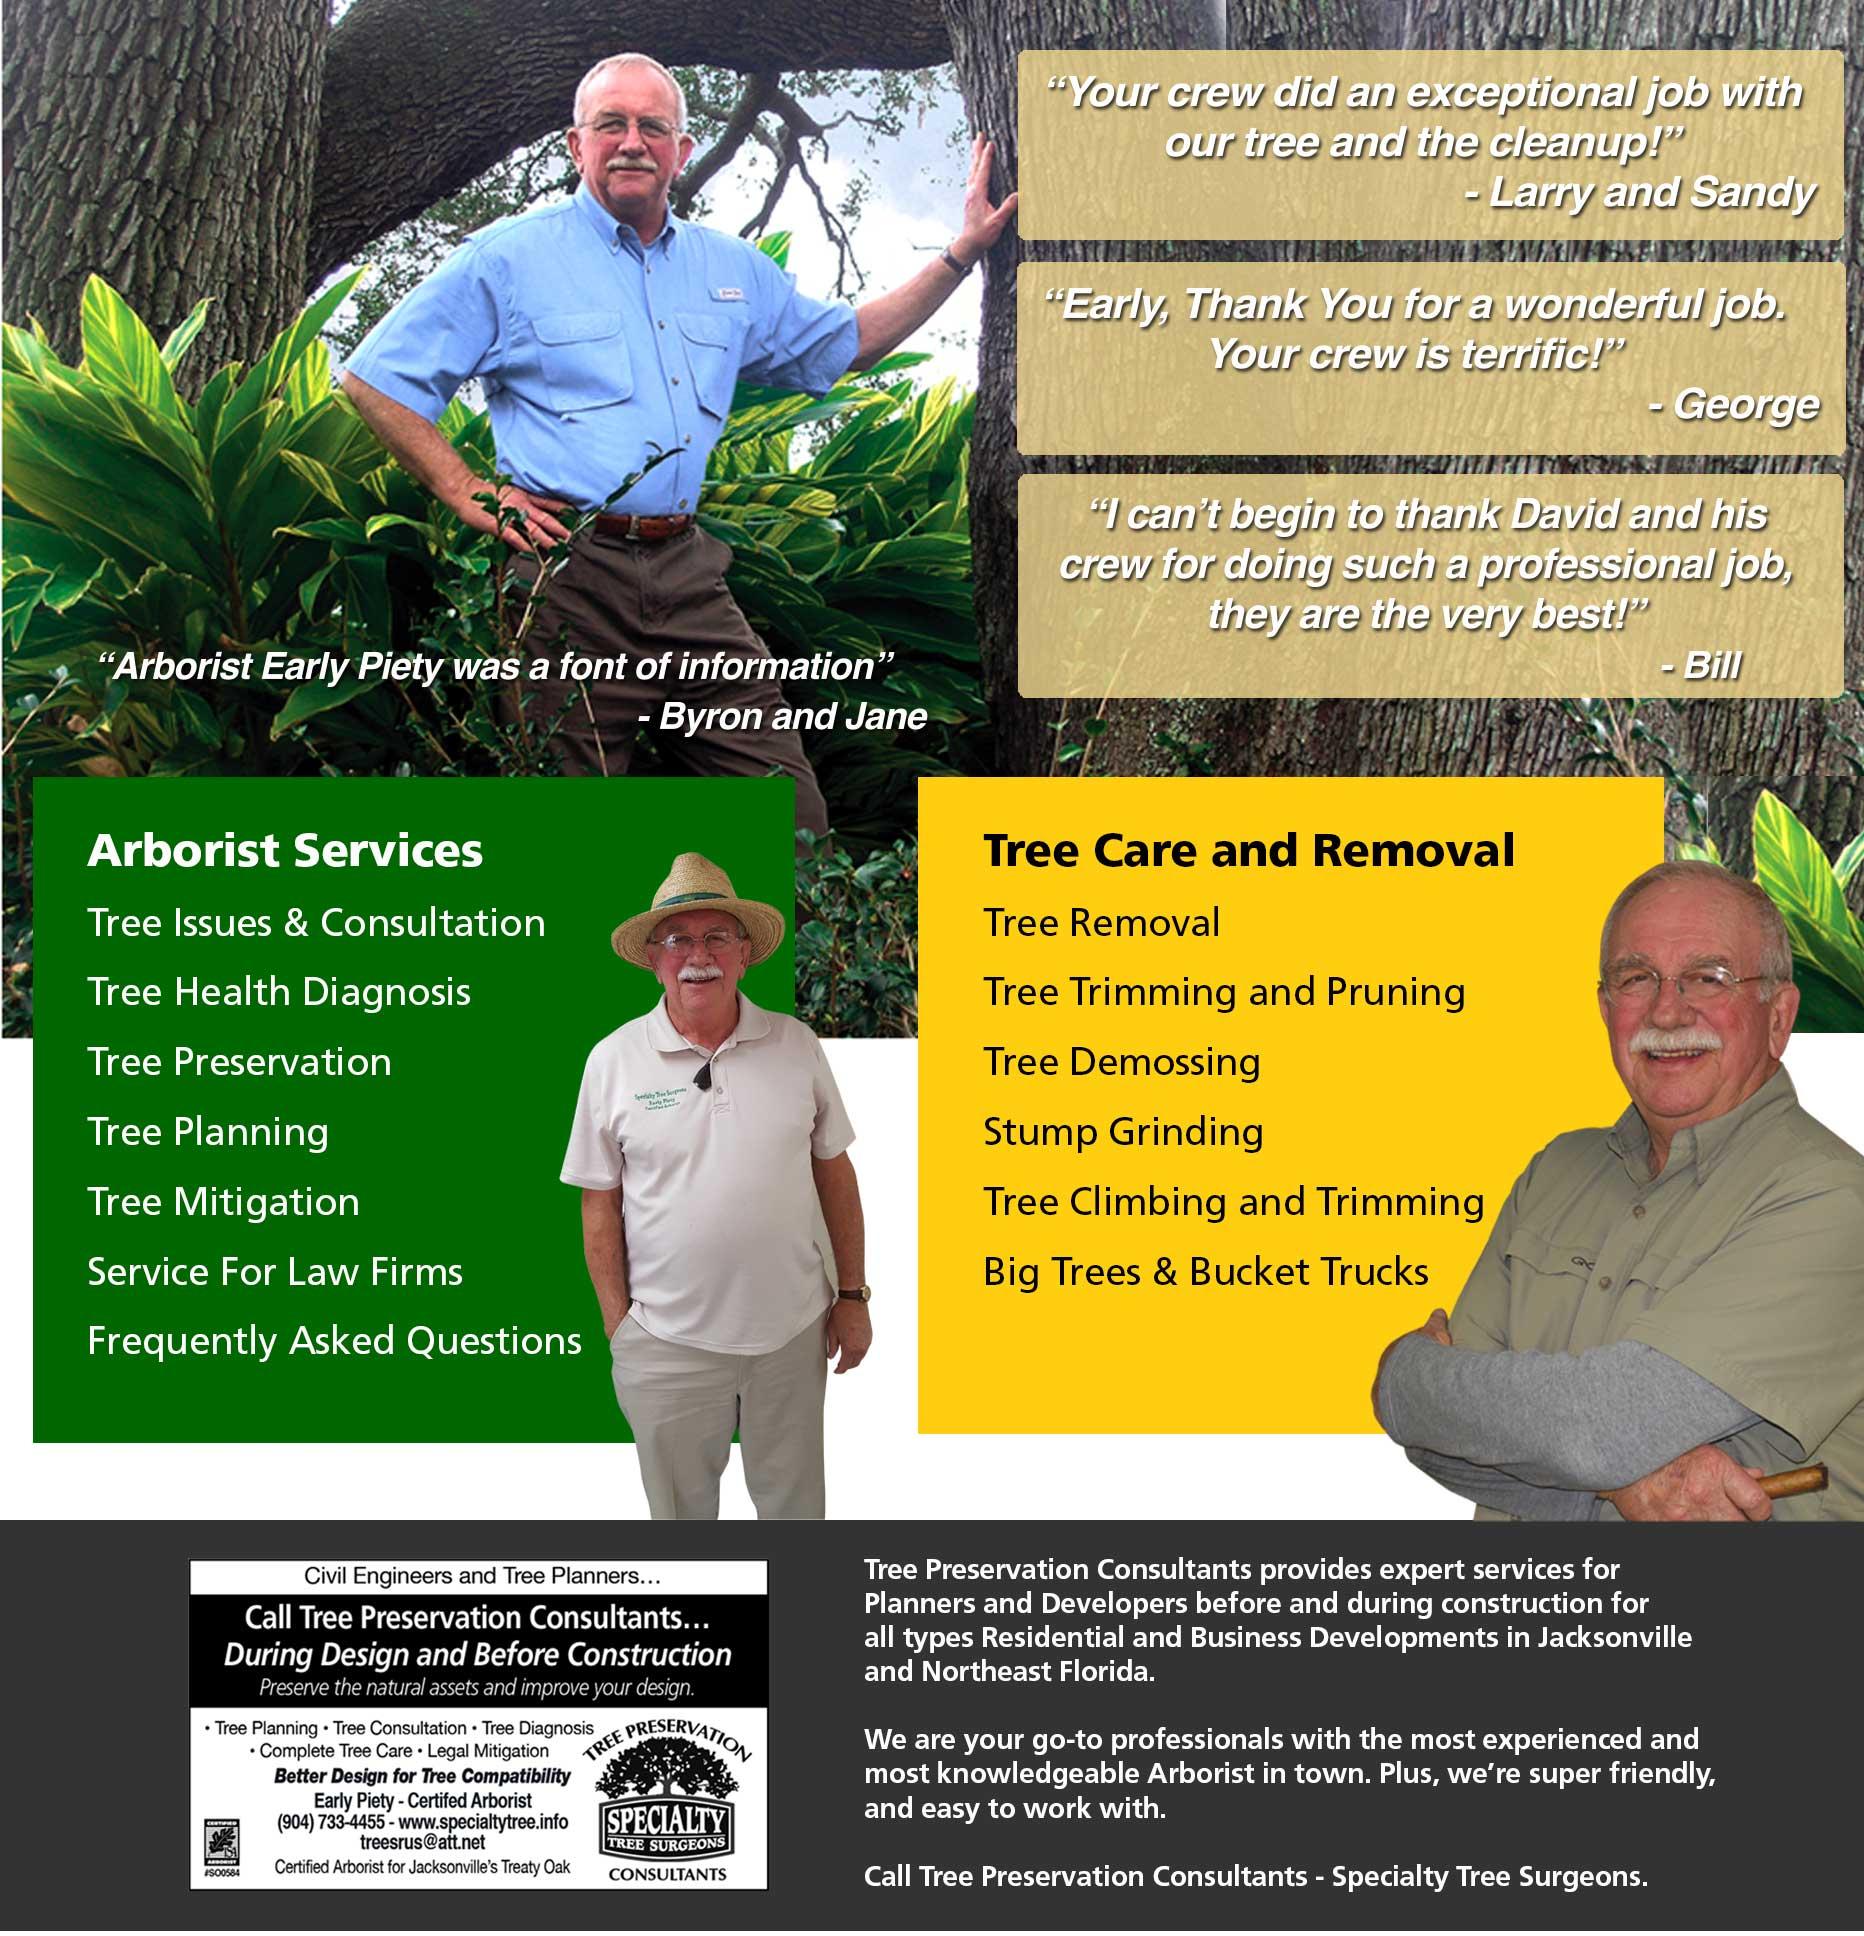 Certified Arborist Jacksonville Tree Service Tree Trimming Tree Removal Tree Mitigation Tree Planning